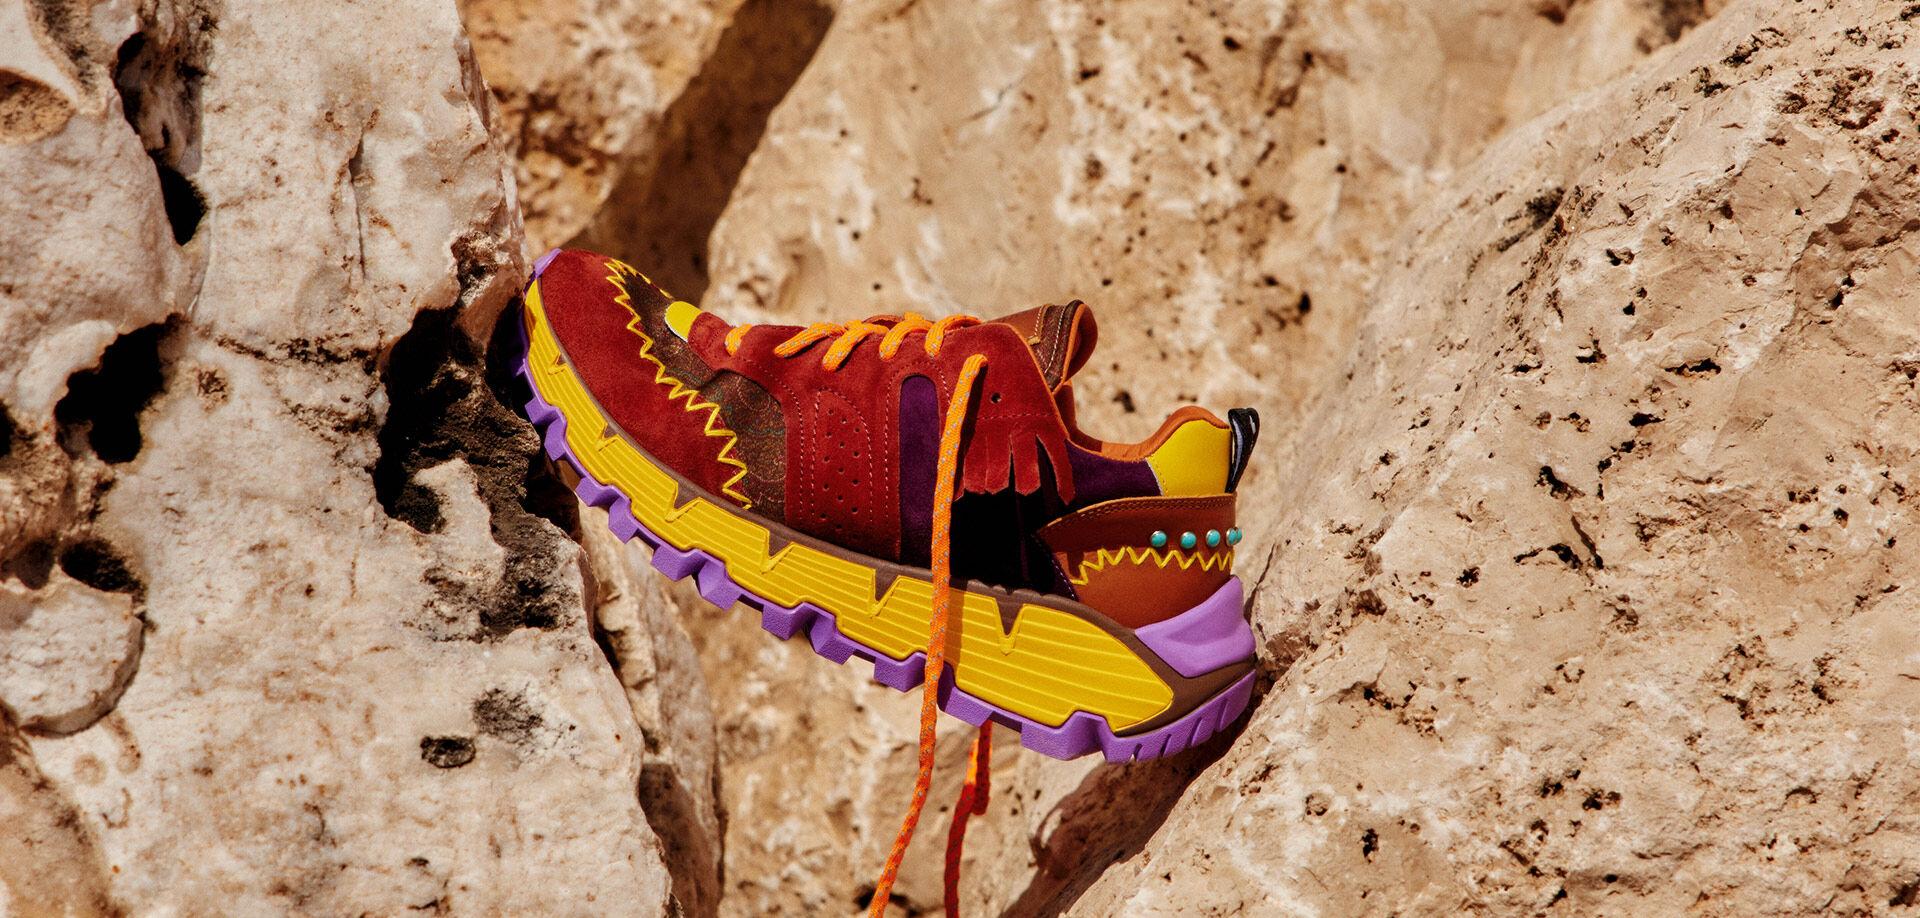 ETRO_Earthbeat sneakers